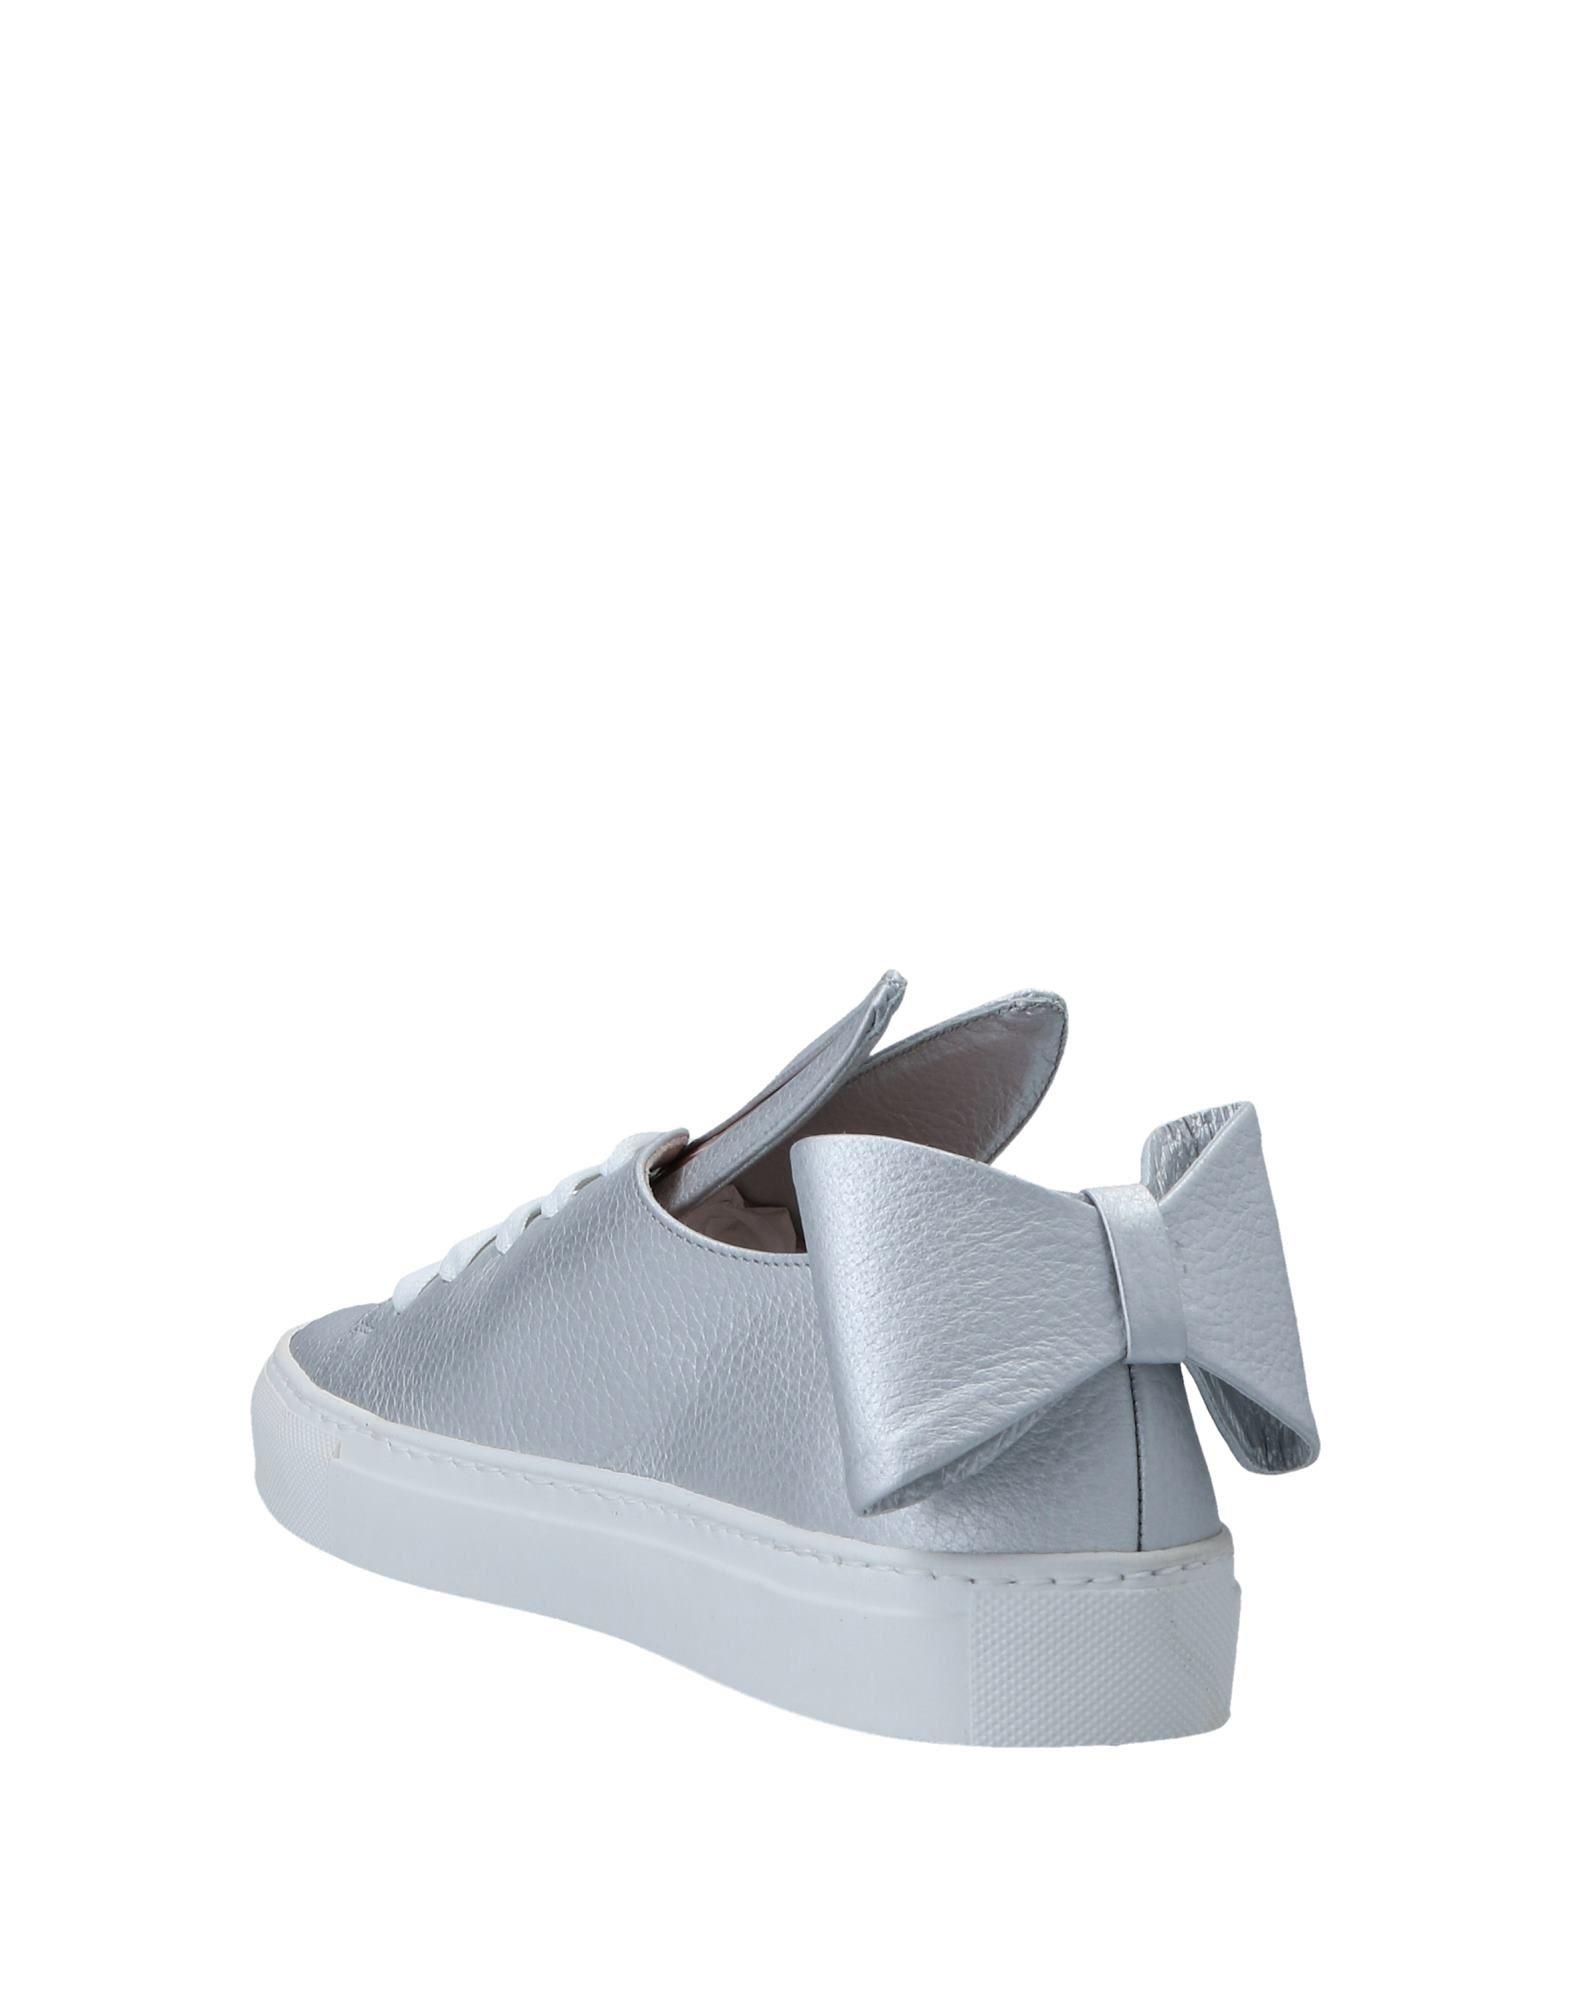 Parikka Minna Parikka  Sneakers Damen  11558065SG 5586f8